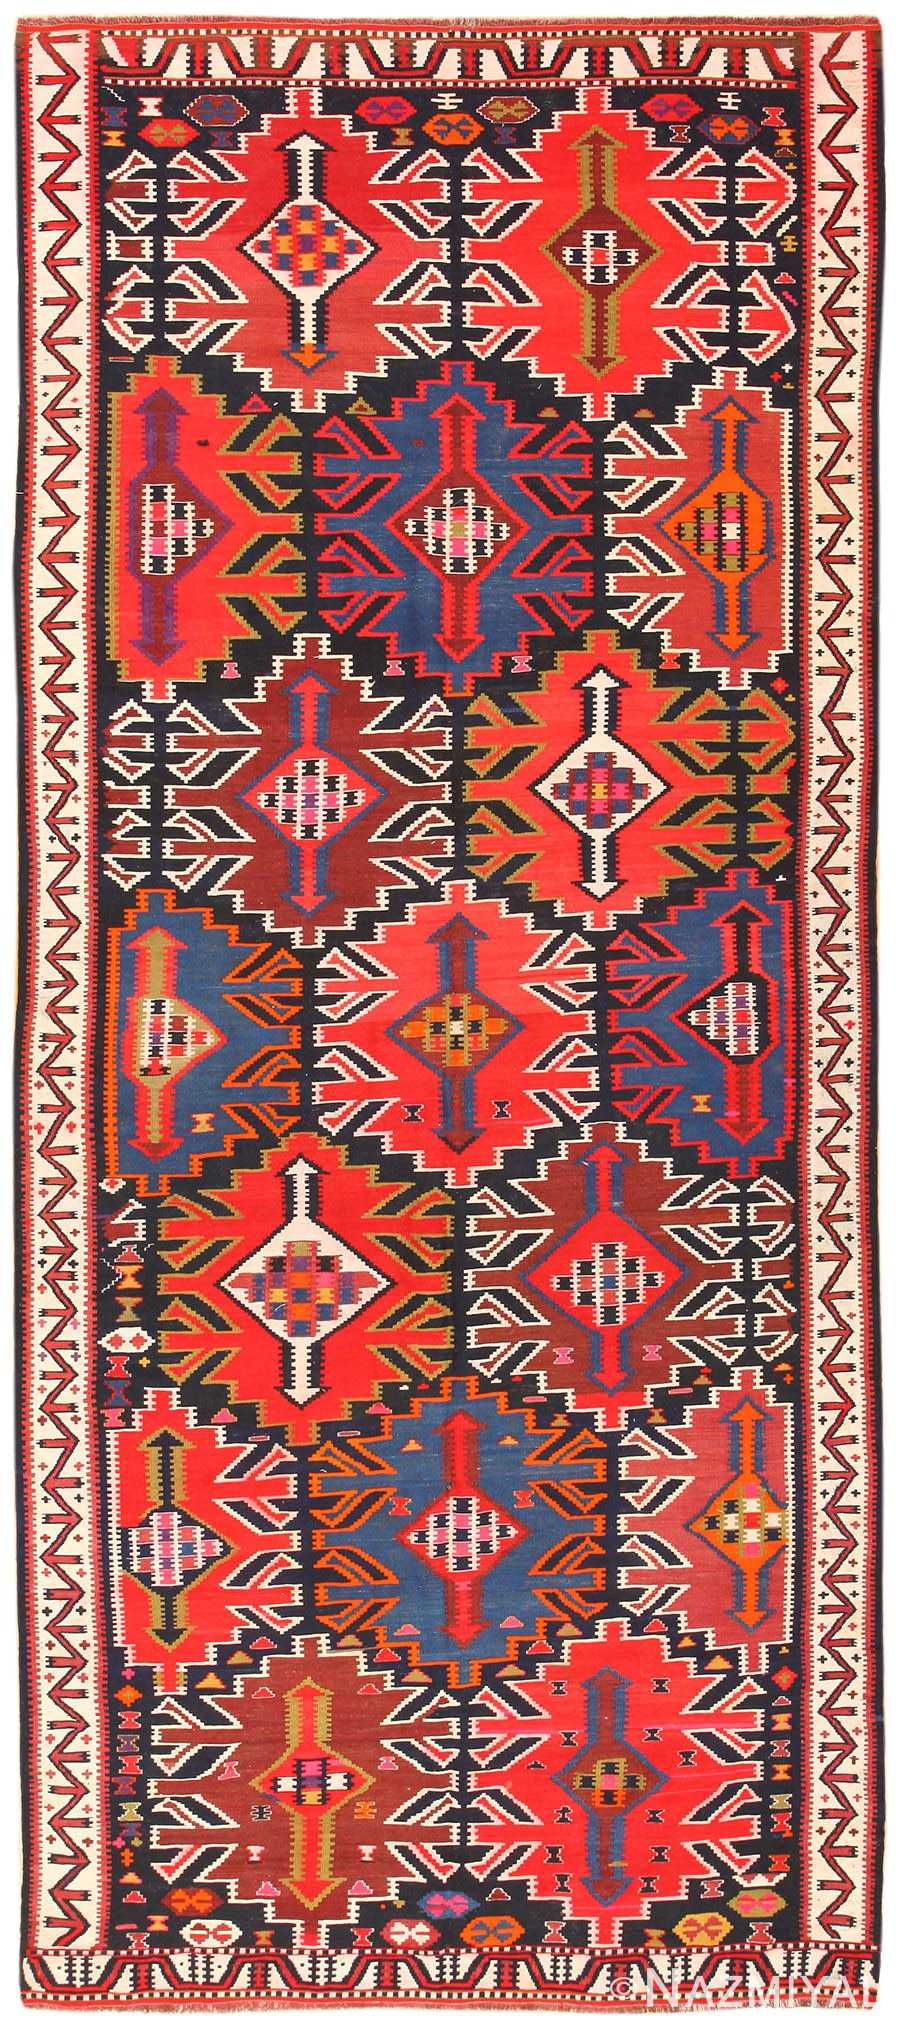 Vintage Turkish Kilim Rug 50421 Detail/Large View